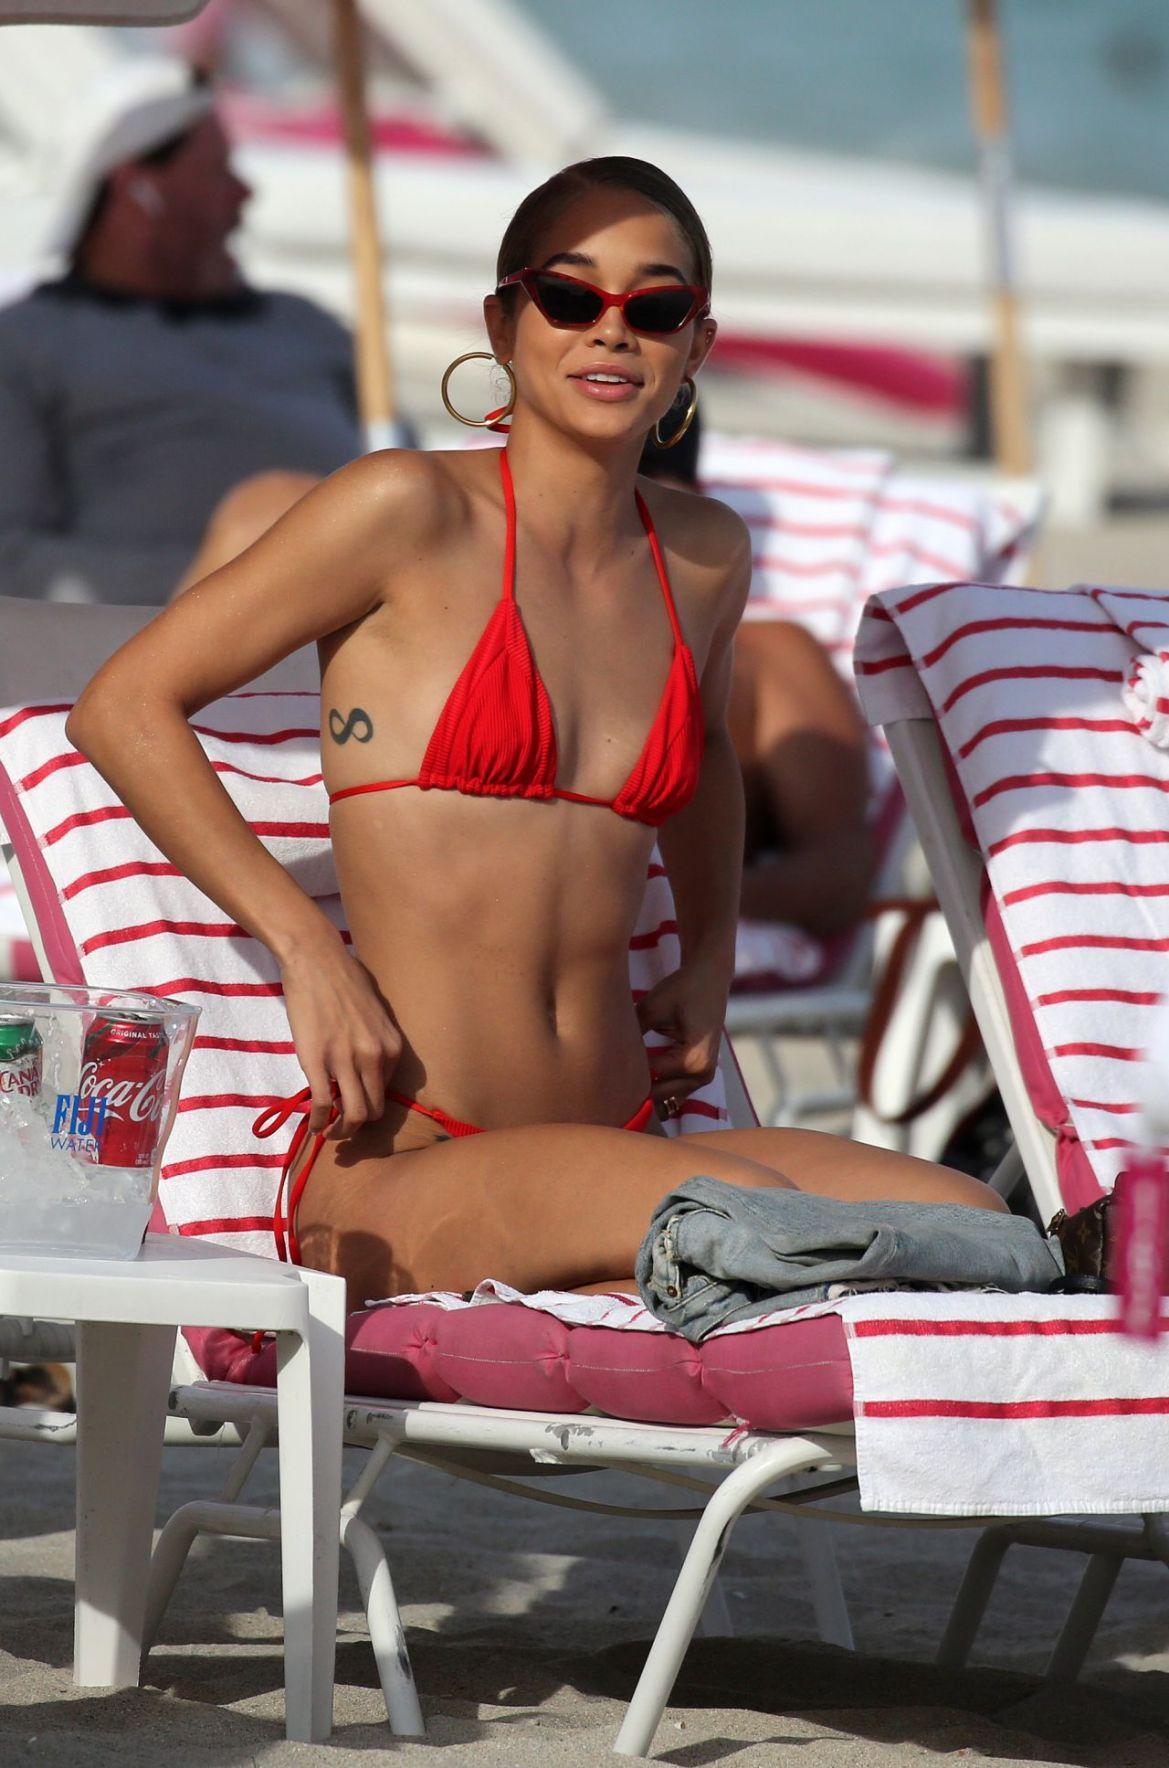 Jasmine Sanders in a Red Bikini 11/29/2018